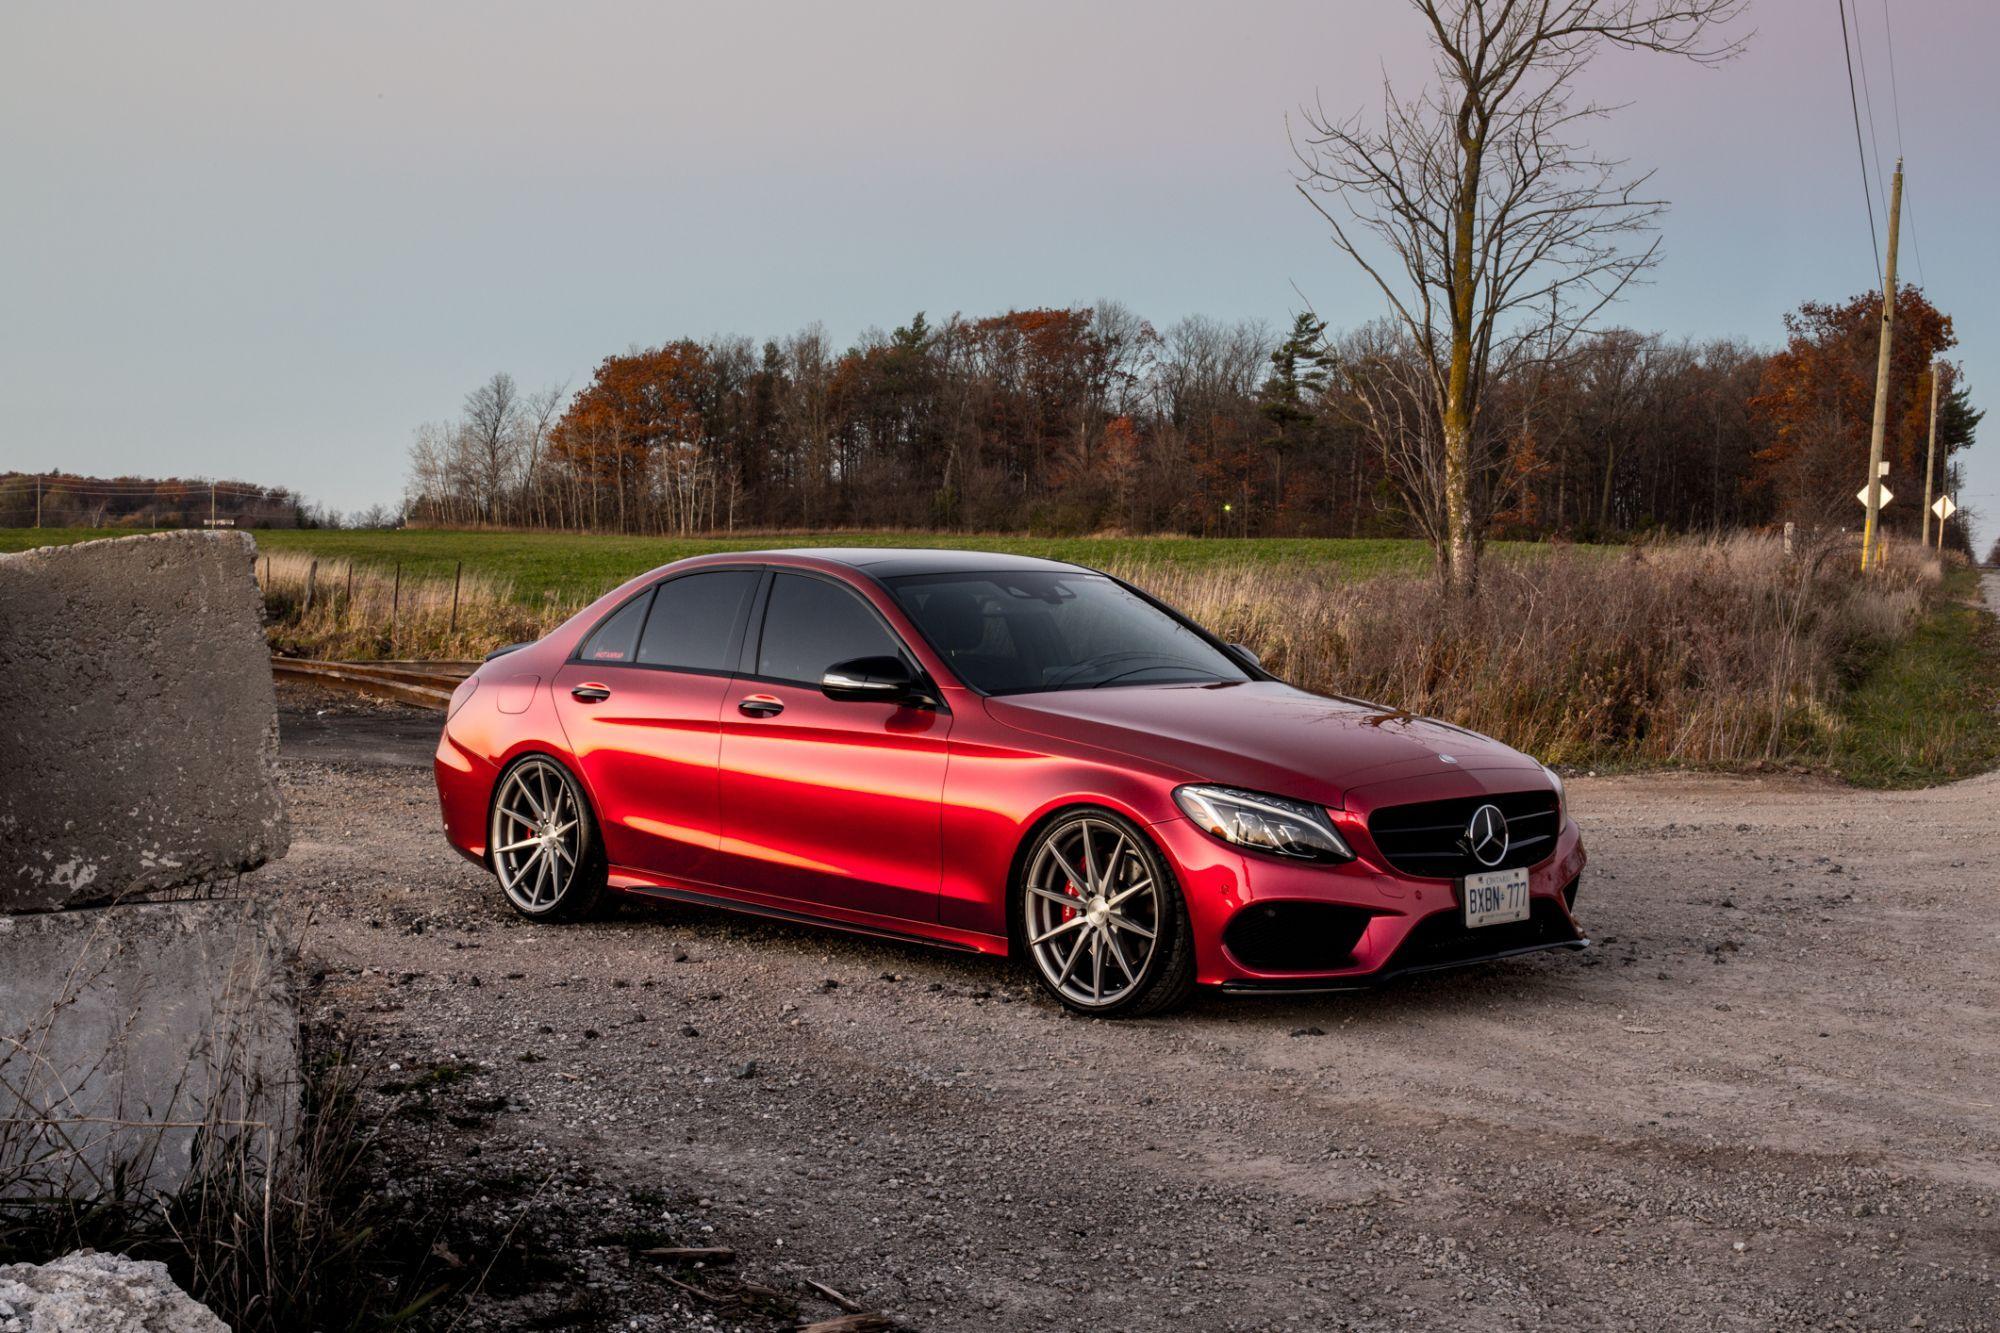 Mercedes C400 in Carbon Red Autoflex coatings #notawrap